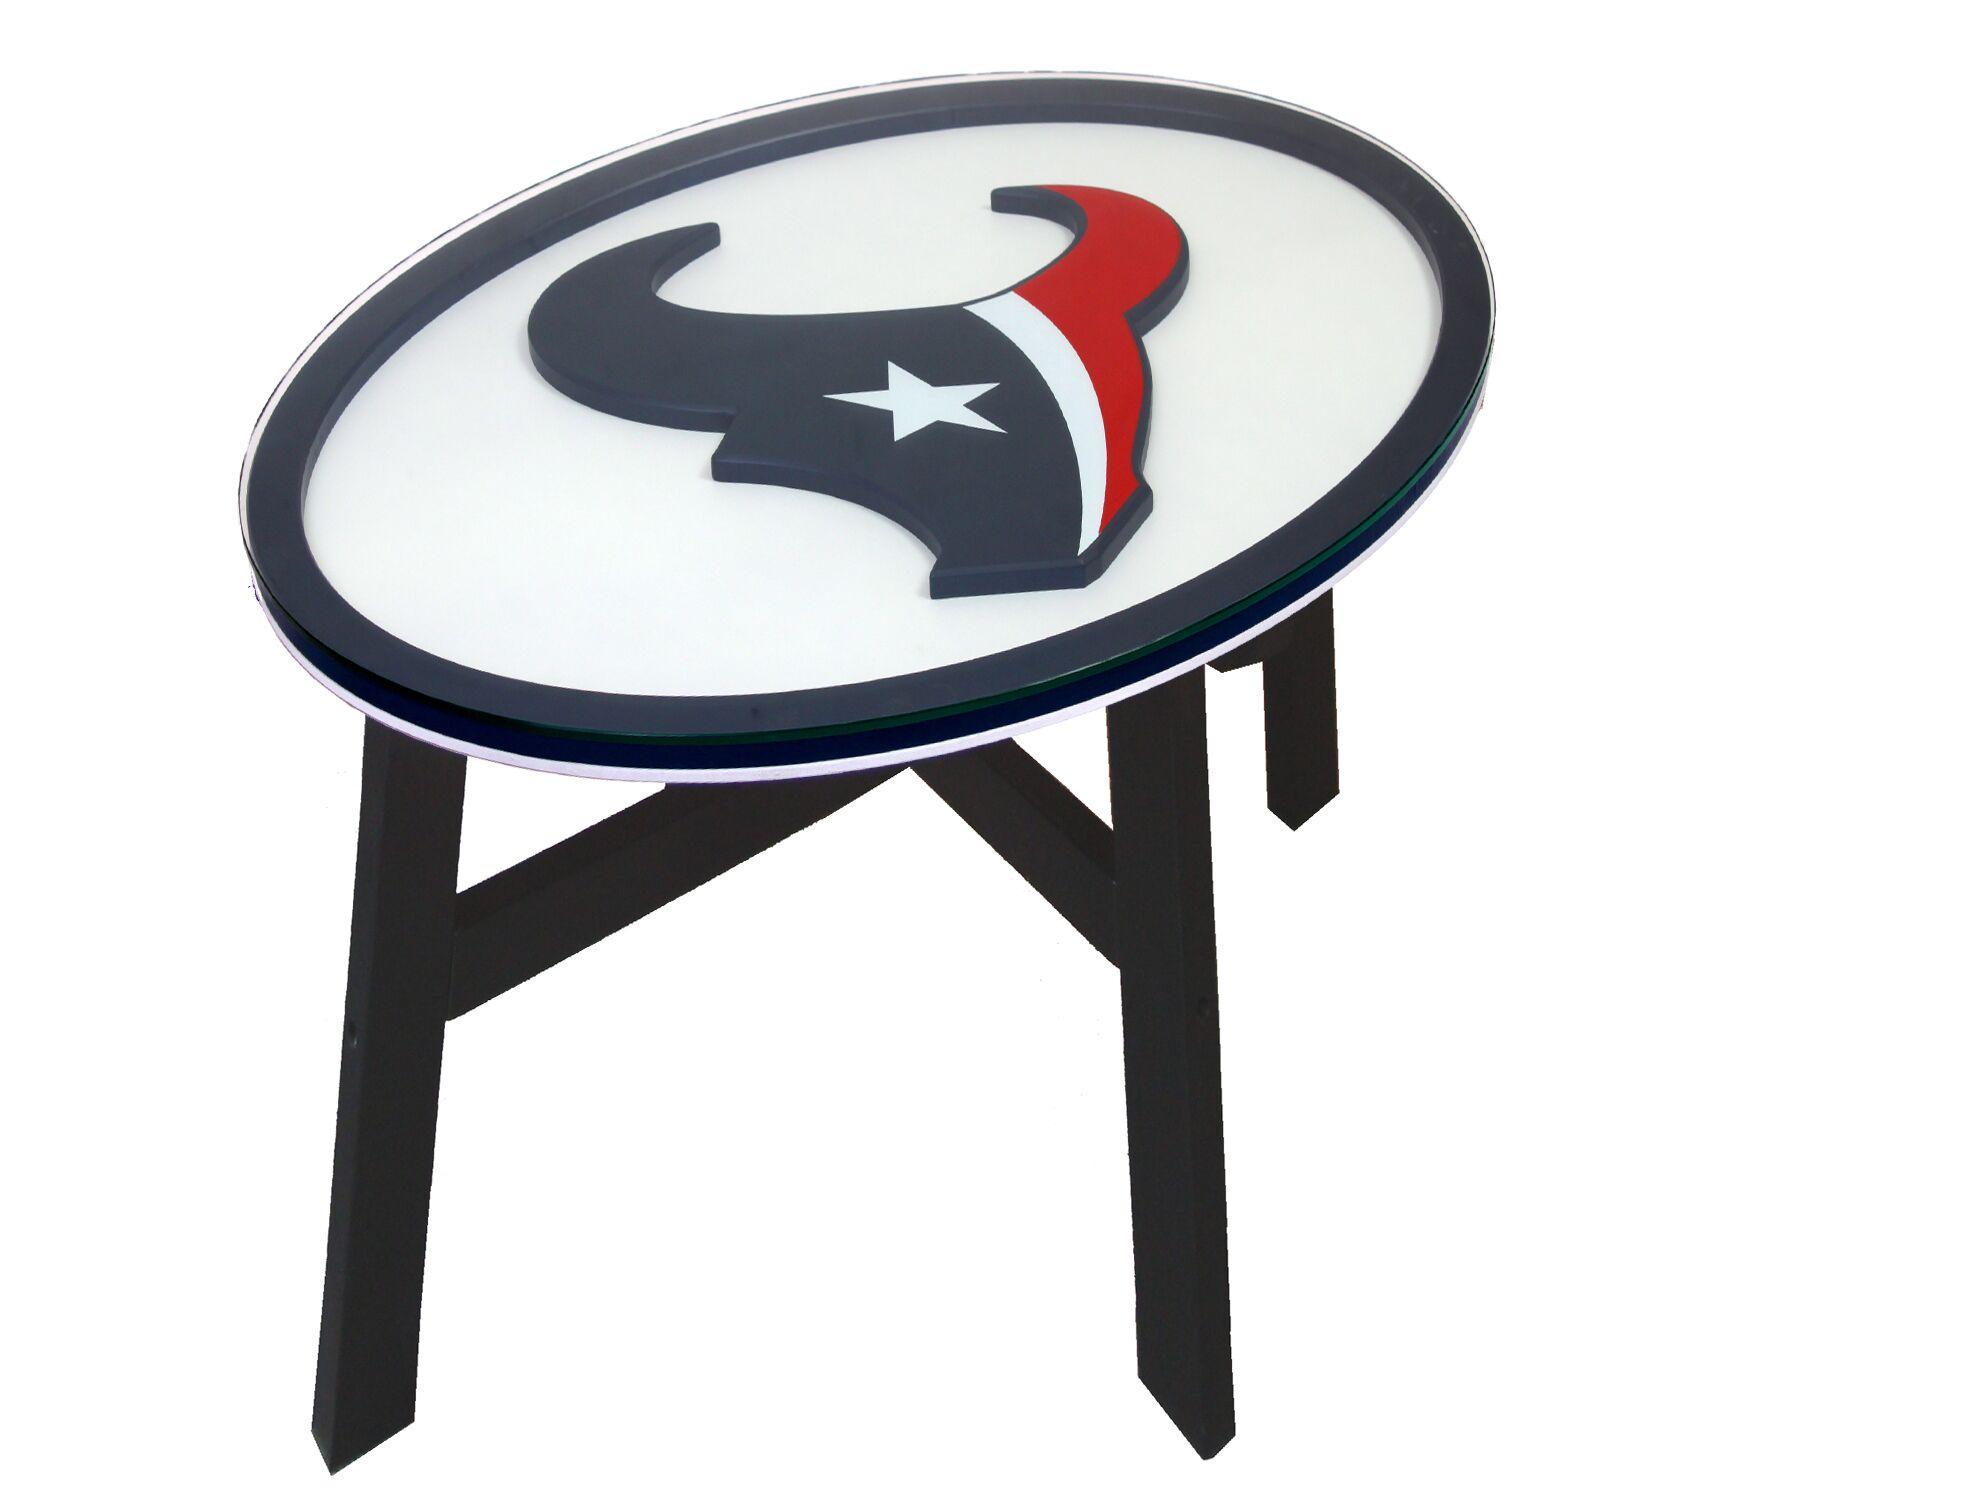 NFL End Table NFL Team: Houston Texans